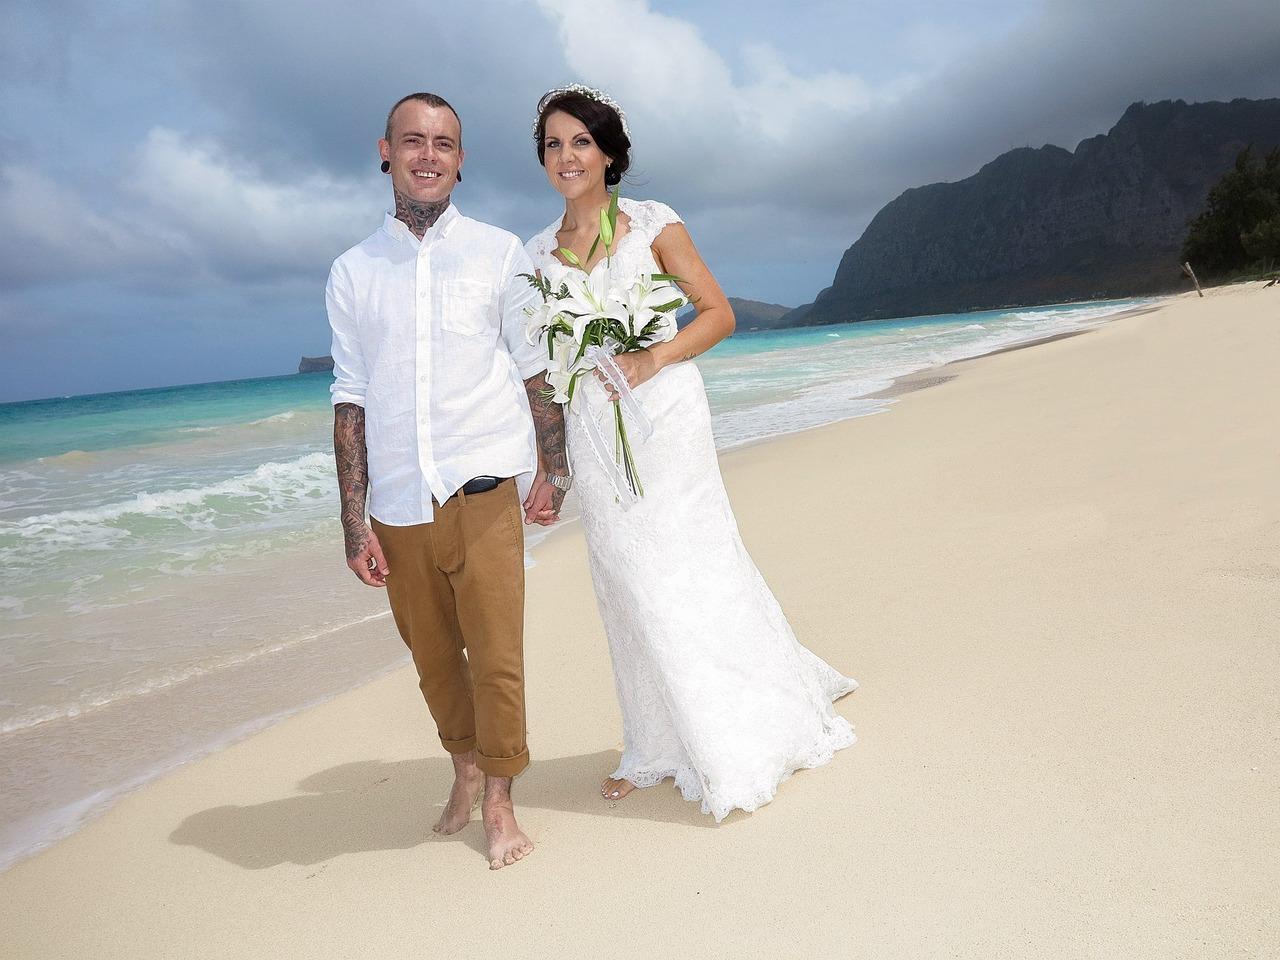 Bride and groom on a Hawaiian beach.